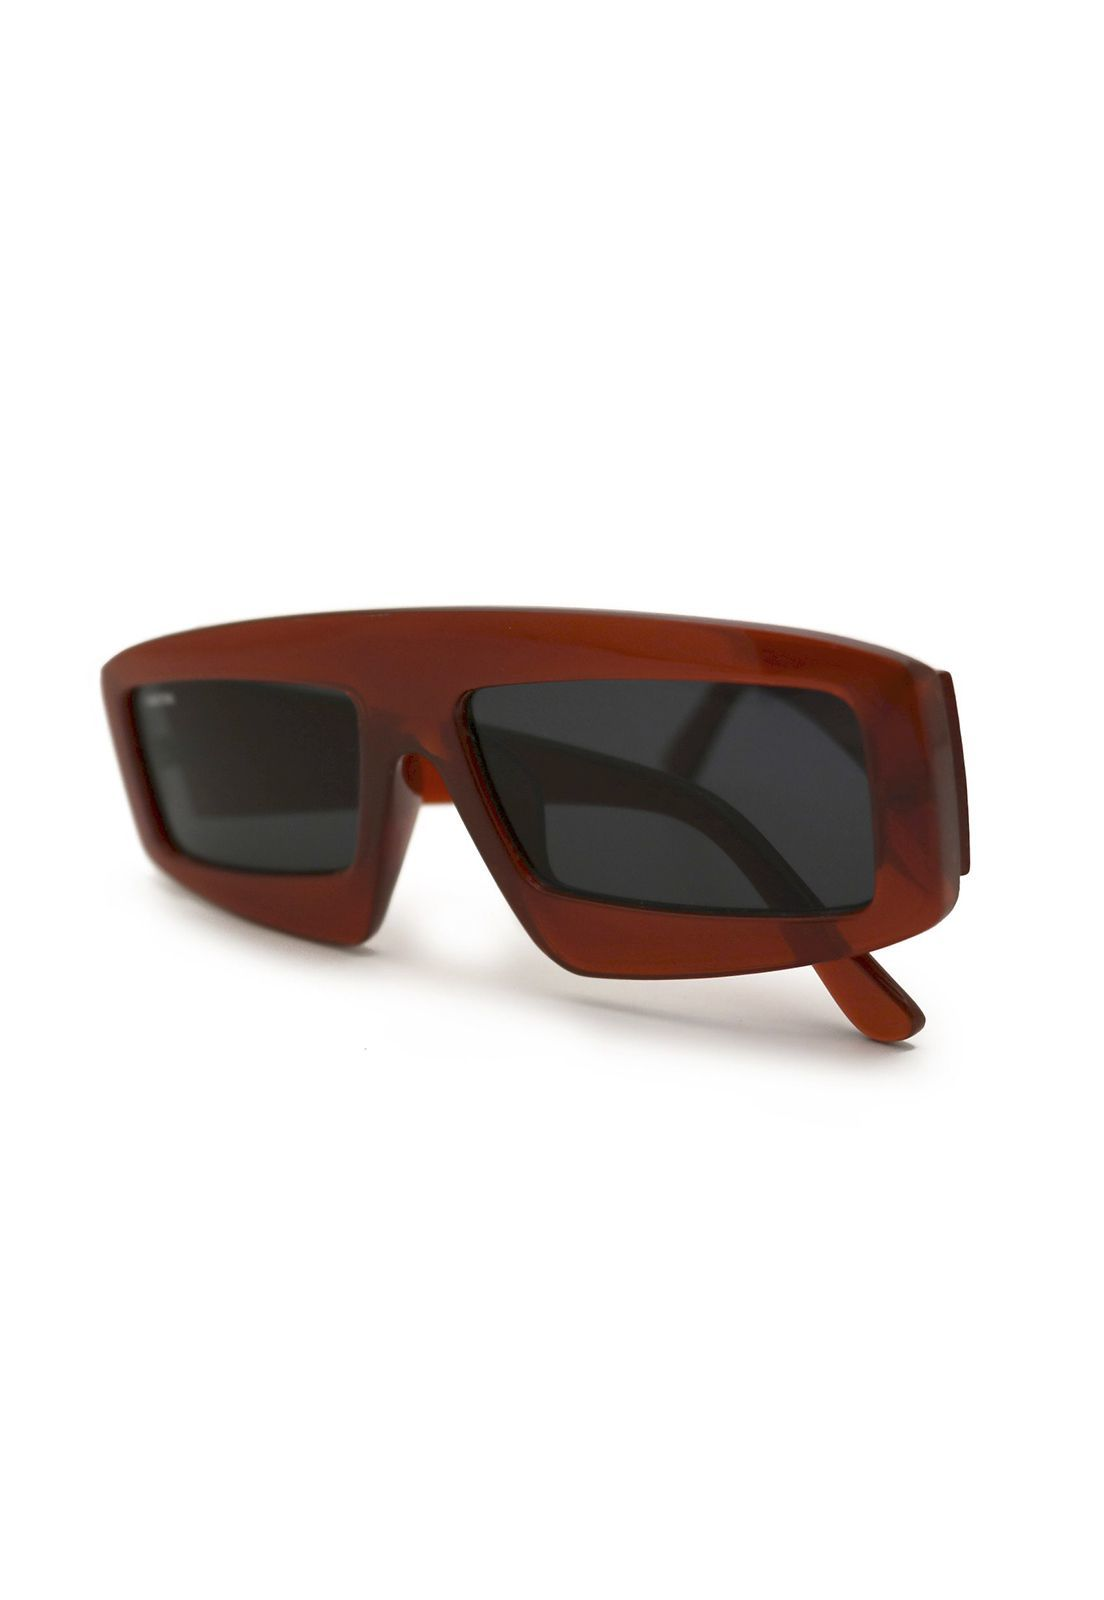 Óculos de Sol Grungetteria Dexter Vinho